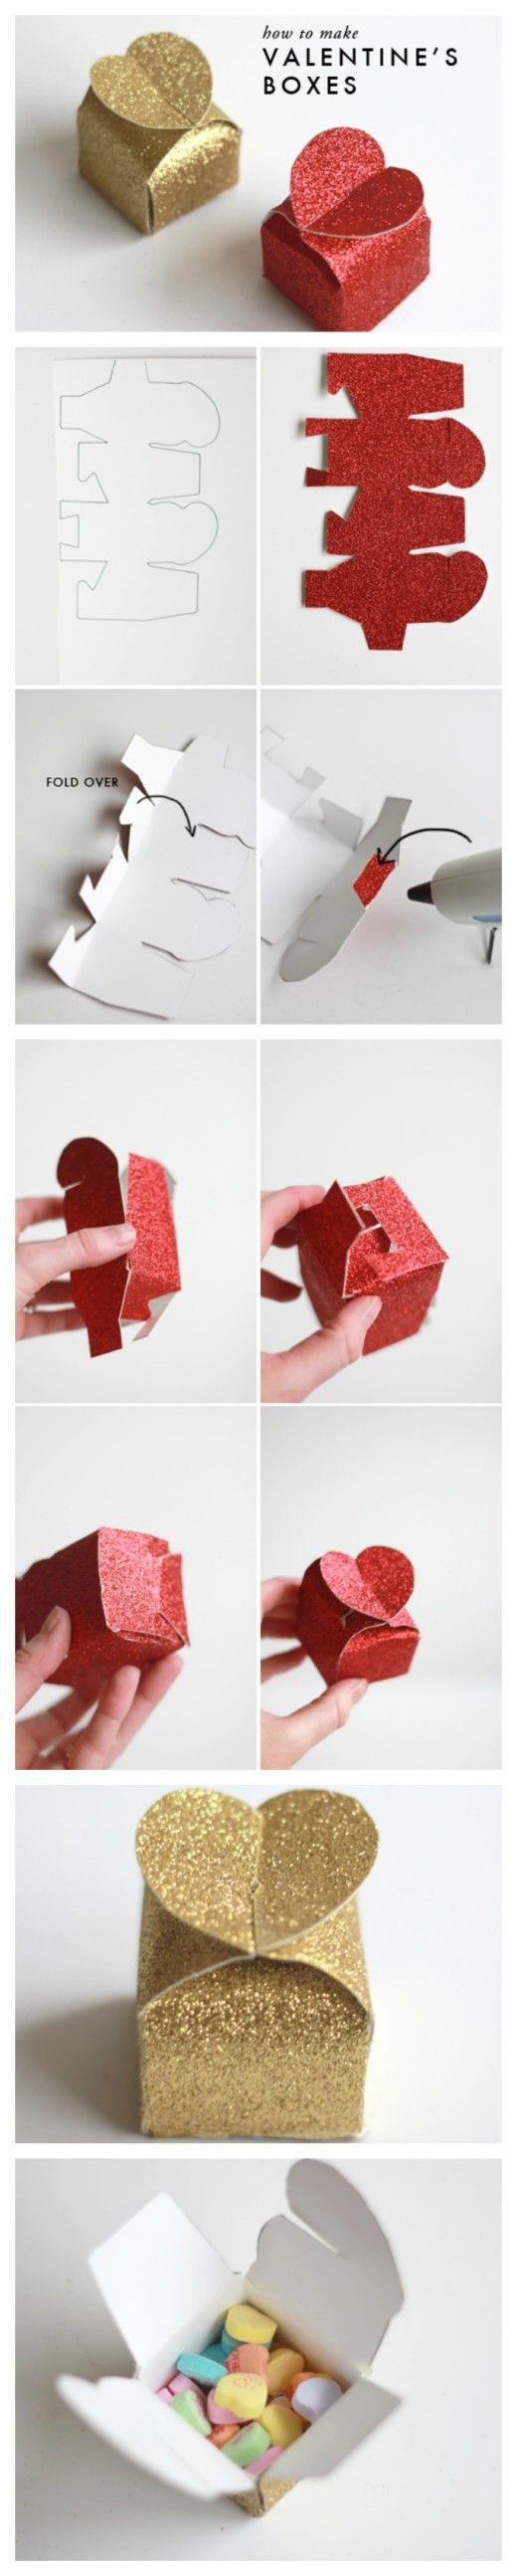 How to make glitter Valentine's heart boxes